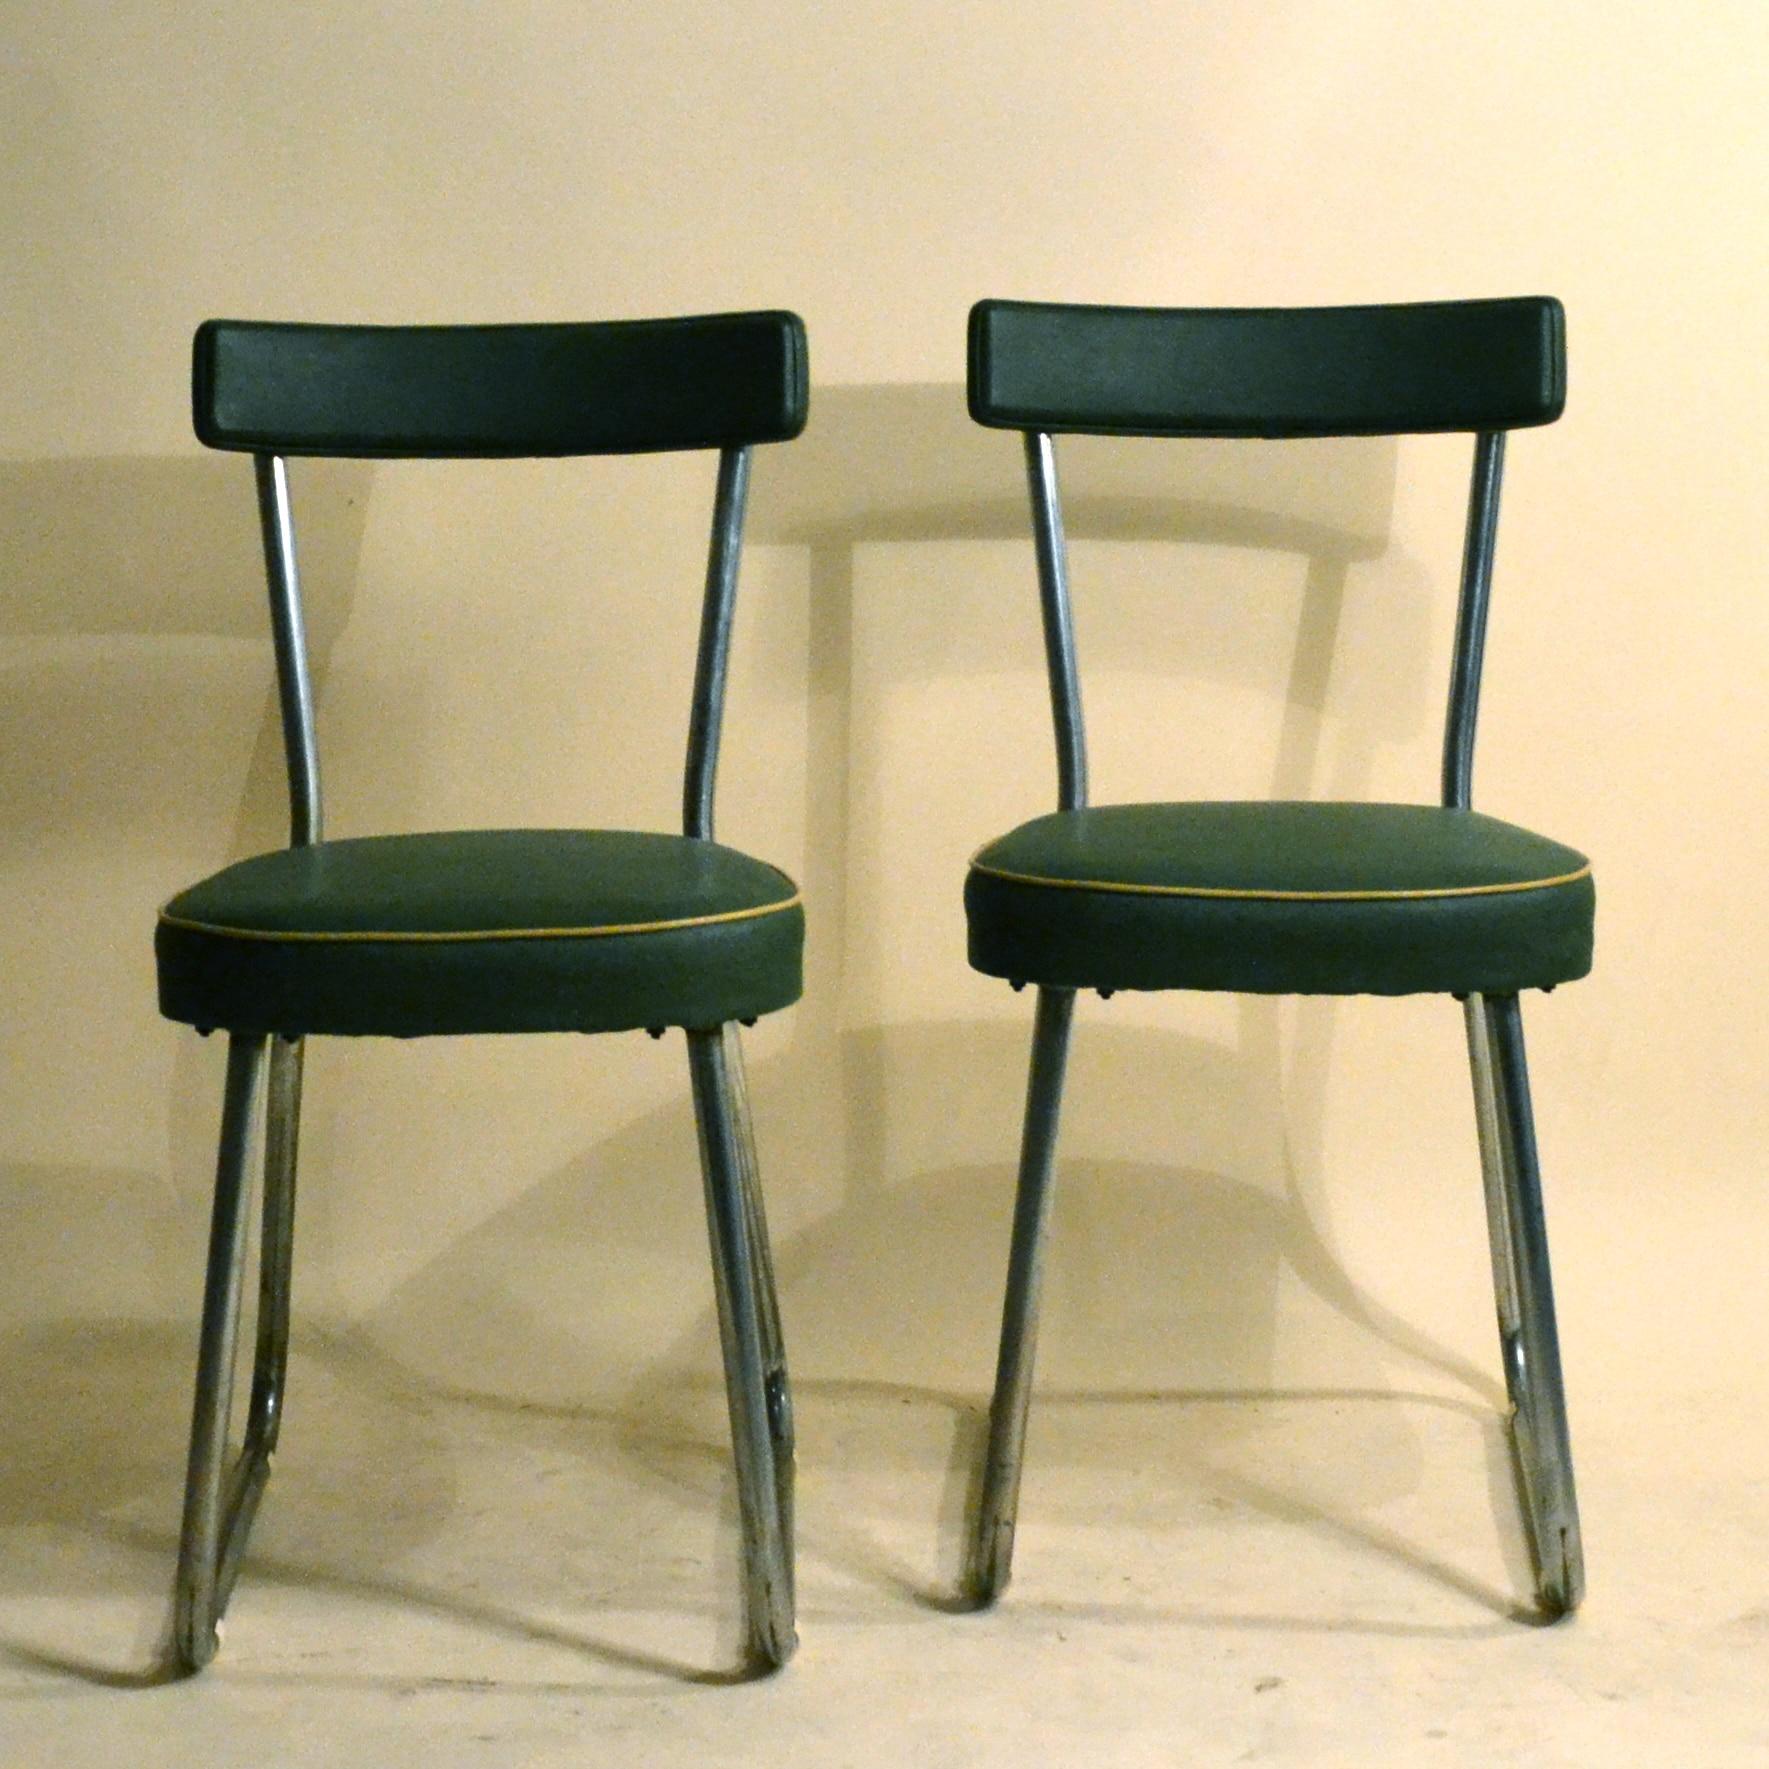 2 chaises design industriel bindies for Chaise design industriel